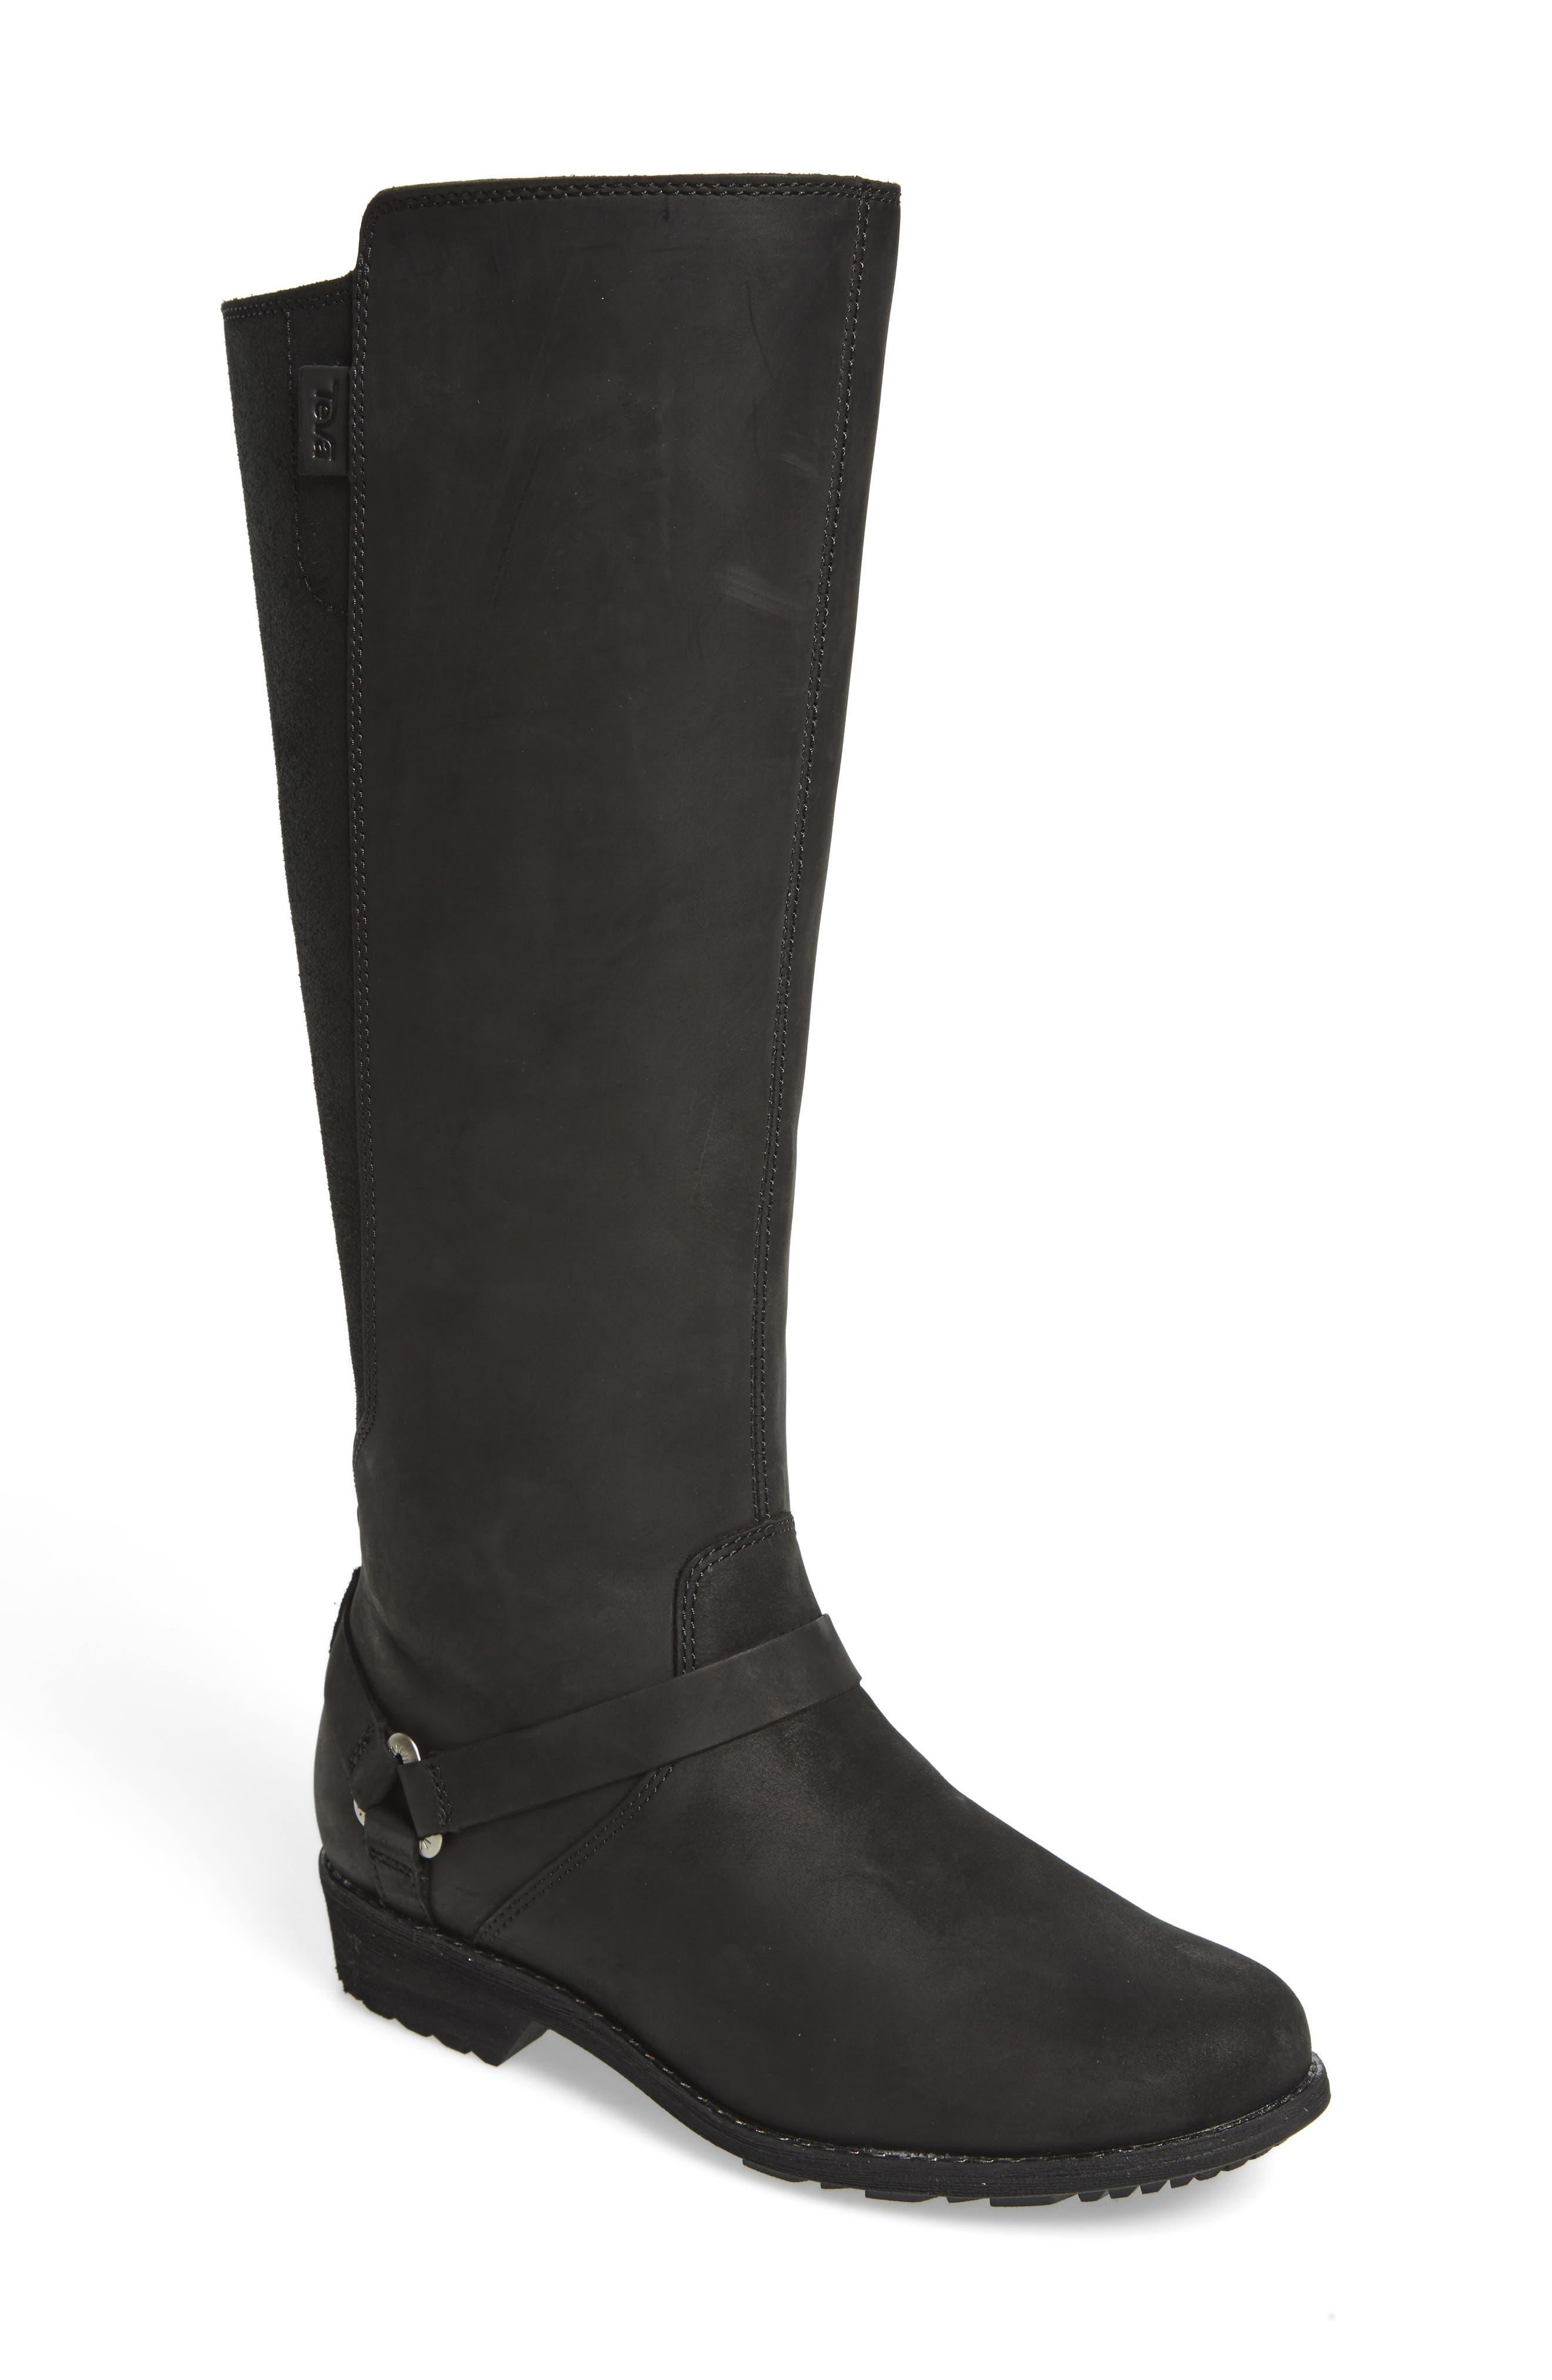 De La Vina Waterproof Boot,                         Main,                         color, BLACK LEATHER